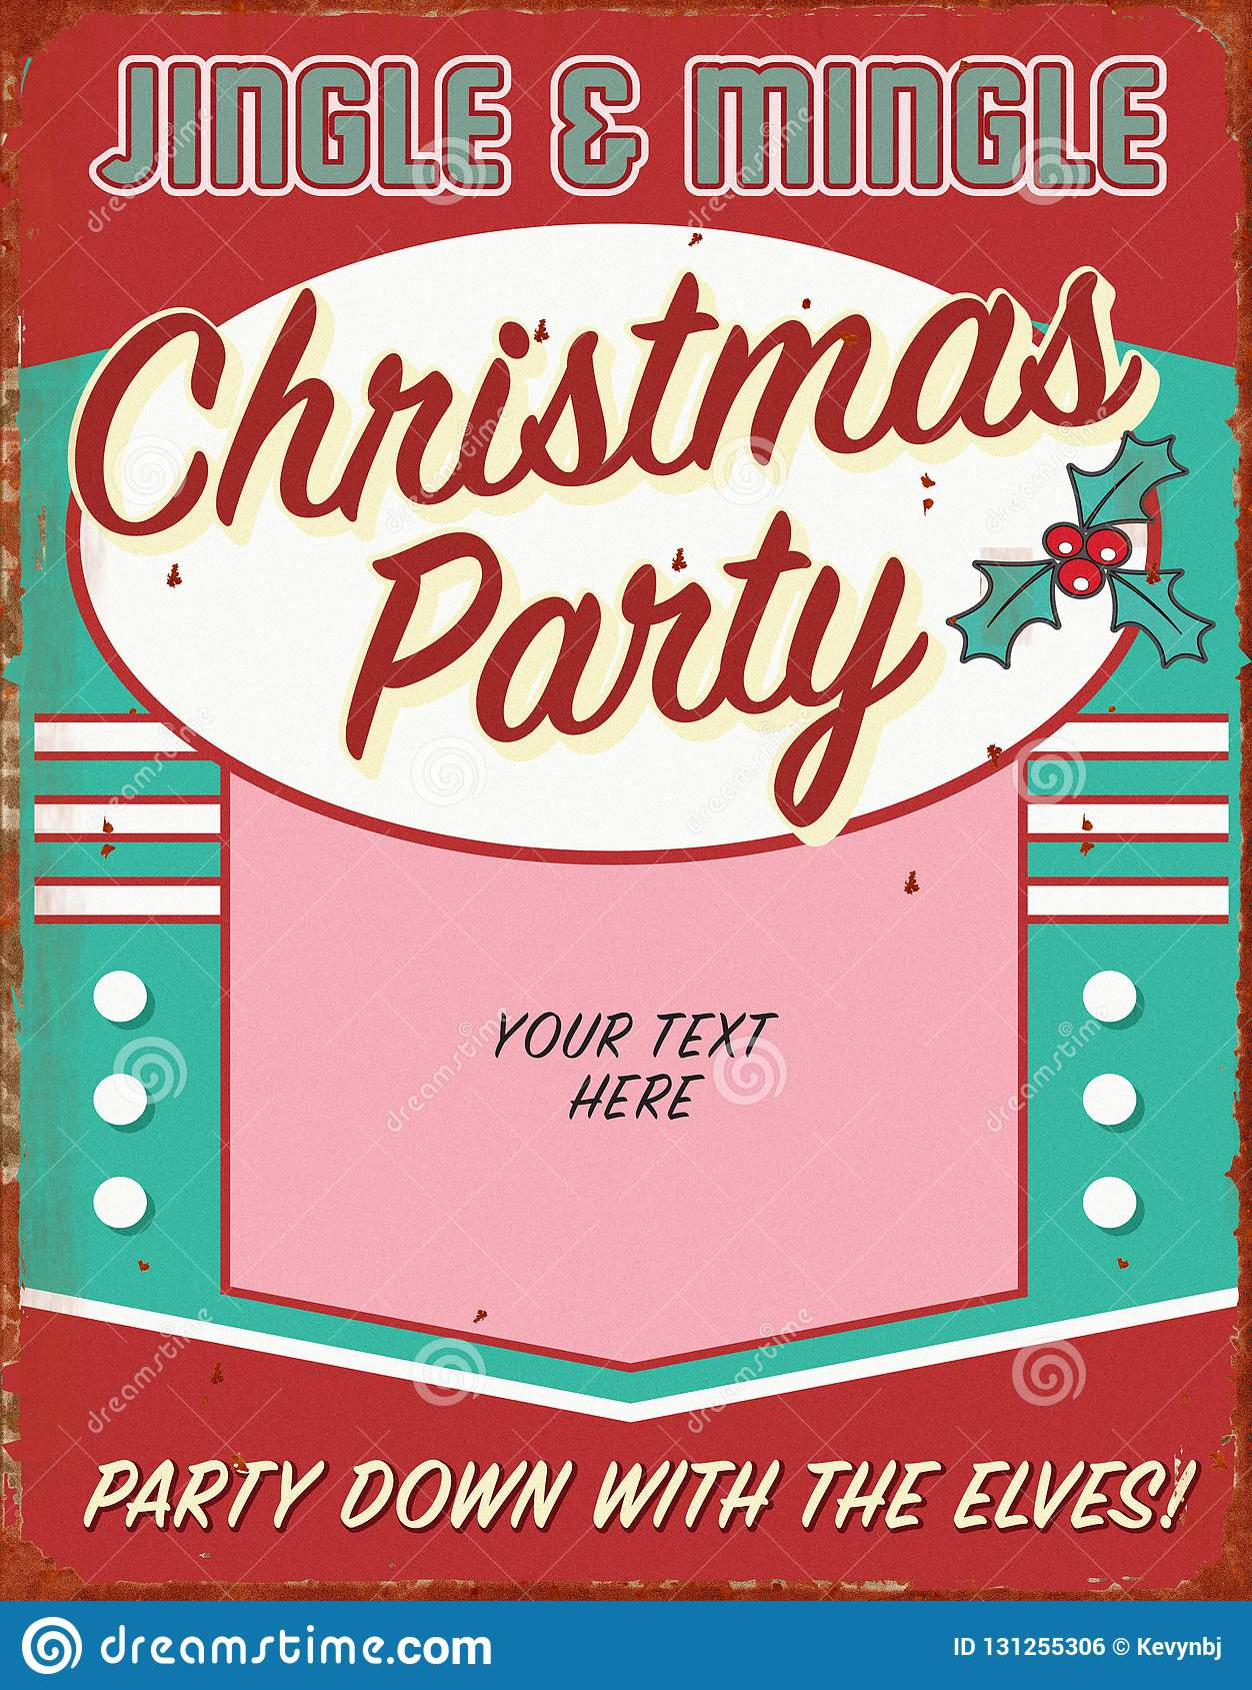 Vintage Christmas Holiday Party Invitation Retro Tin Sign Art Flyer